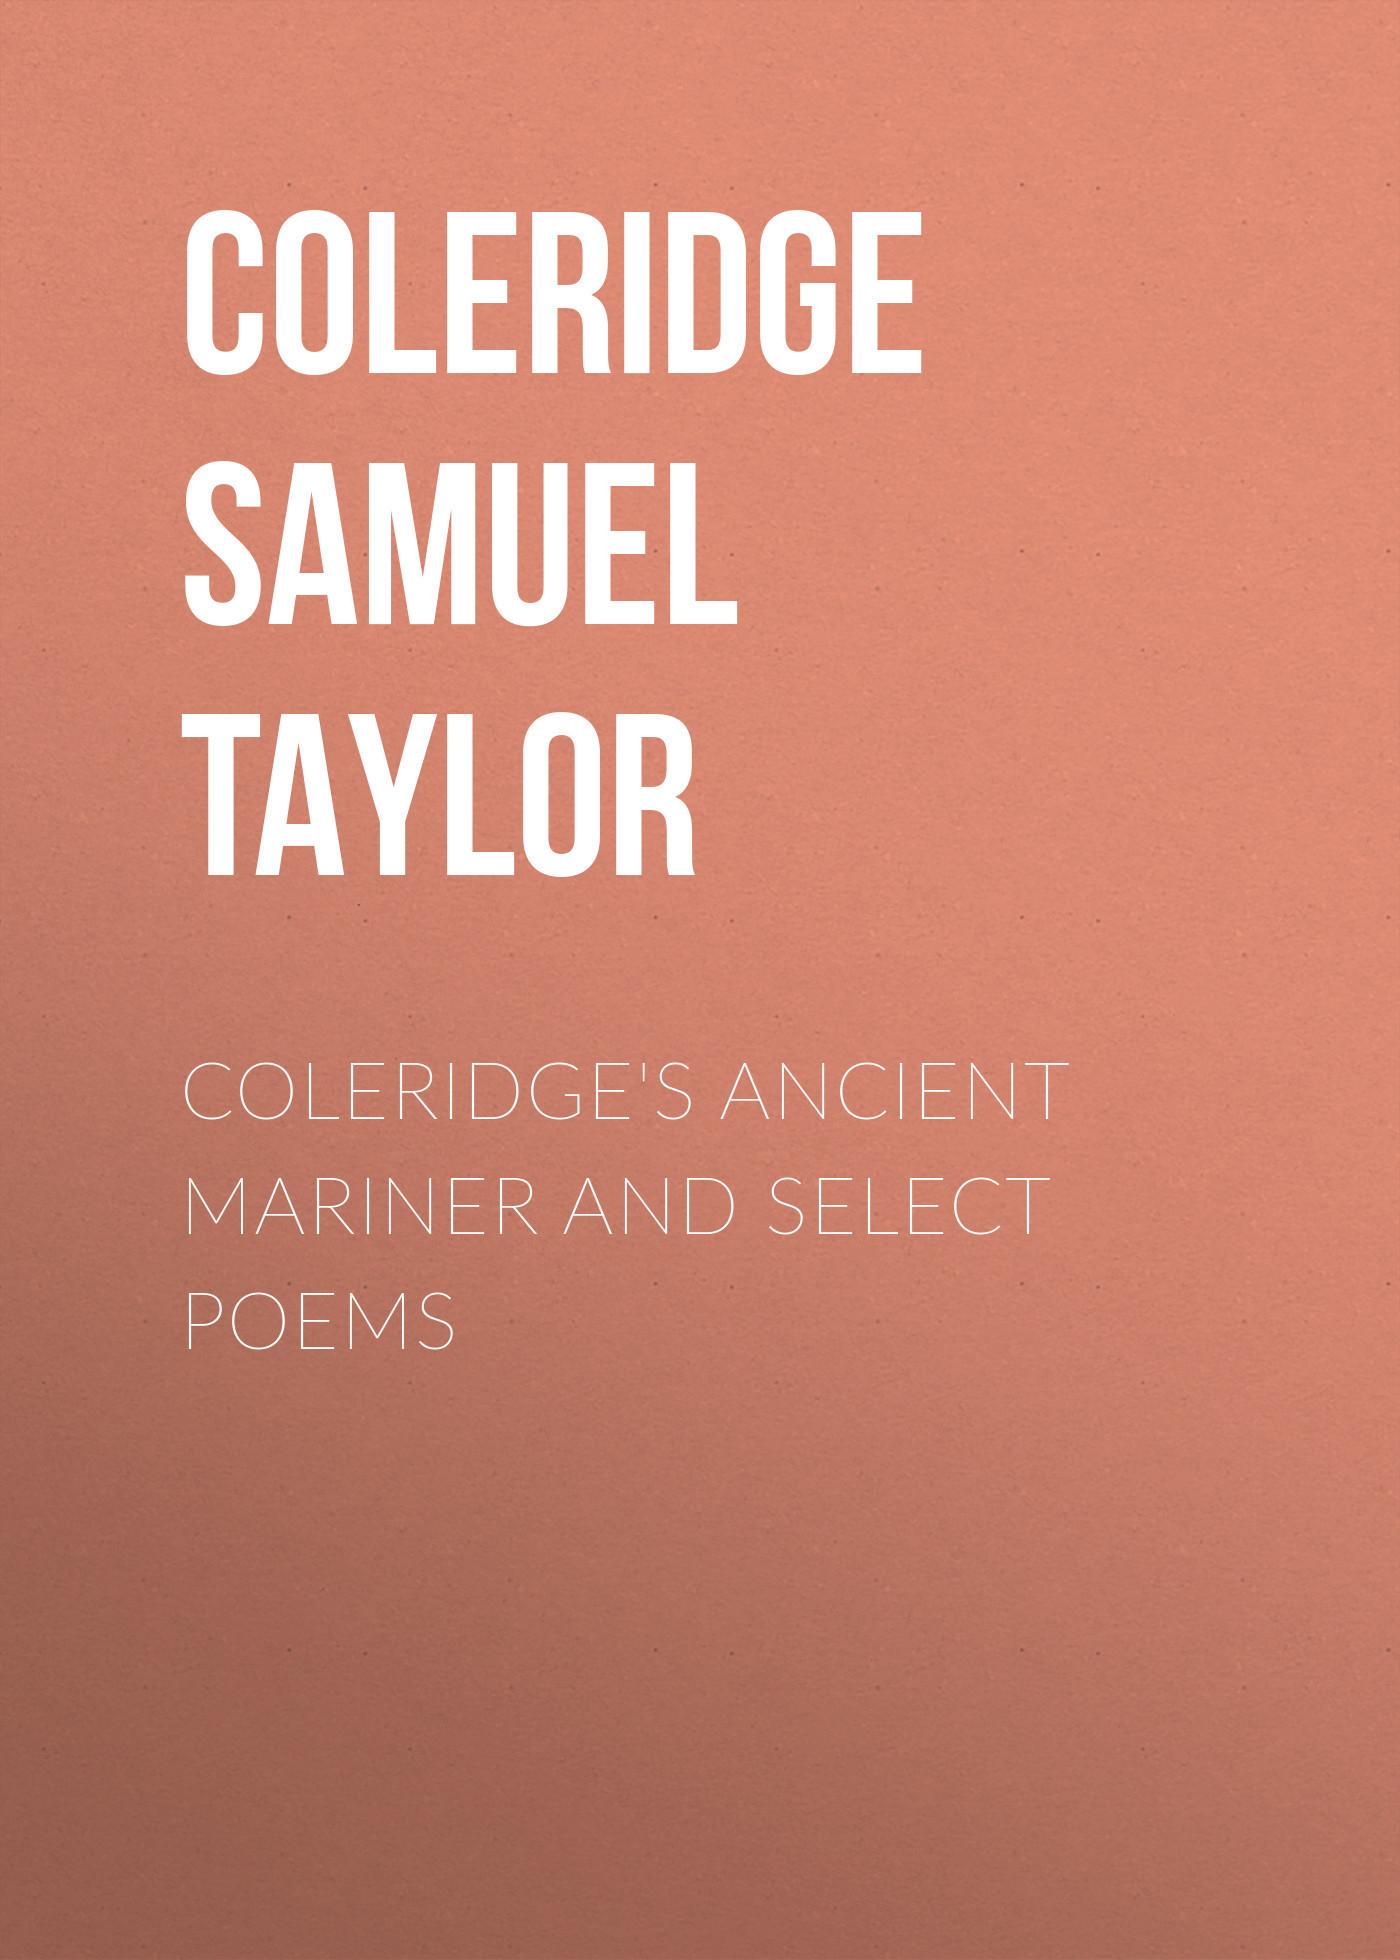 Coleridge Samuel Taylor Coleridge's Ancient Mariner and Select Poems coleridge poems